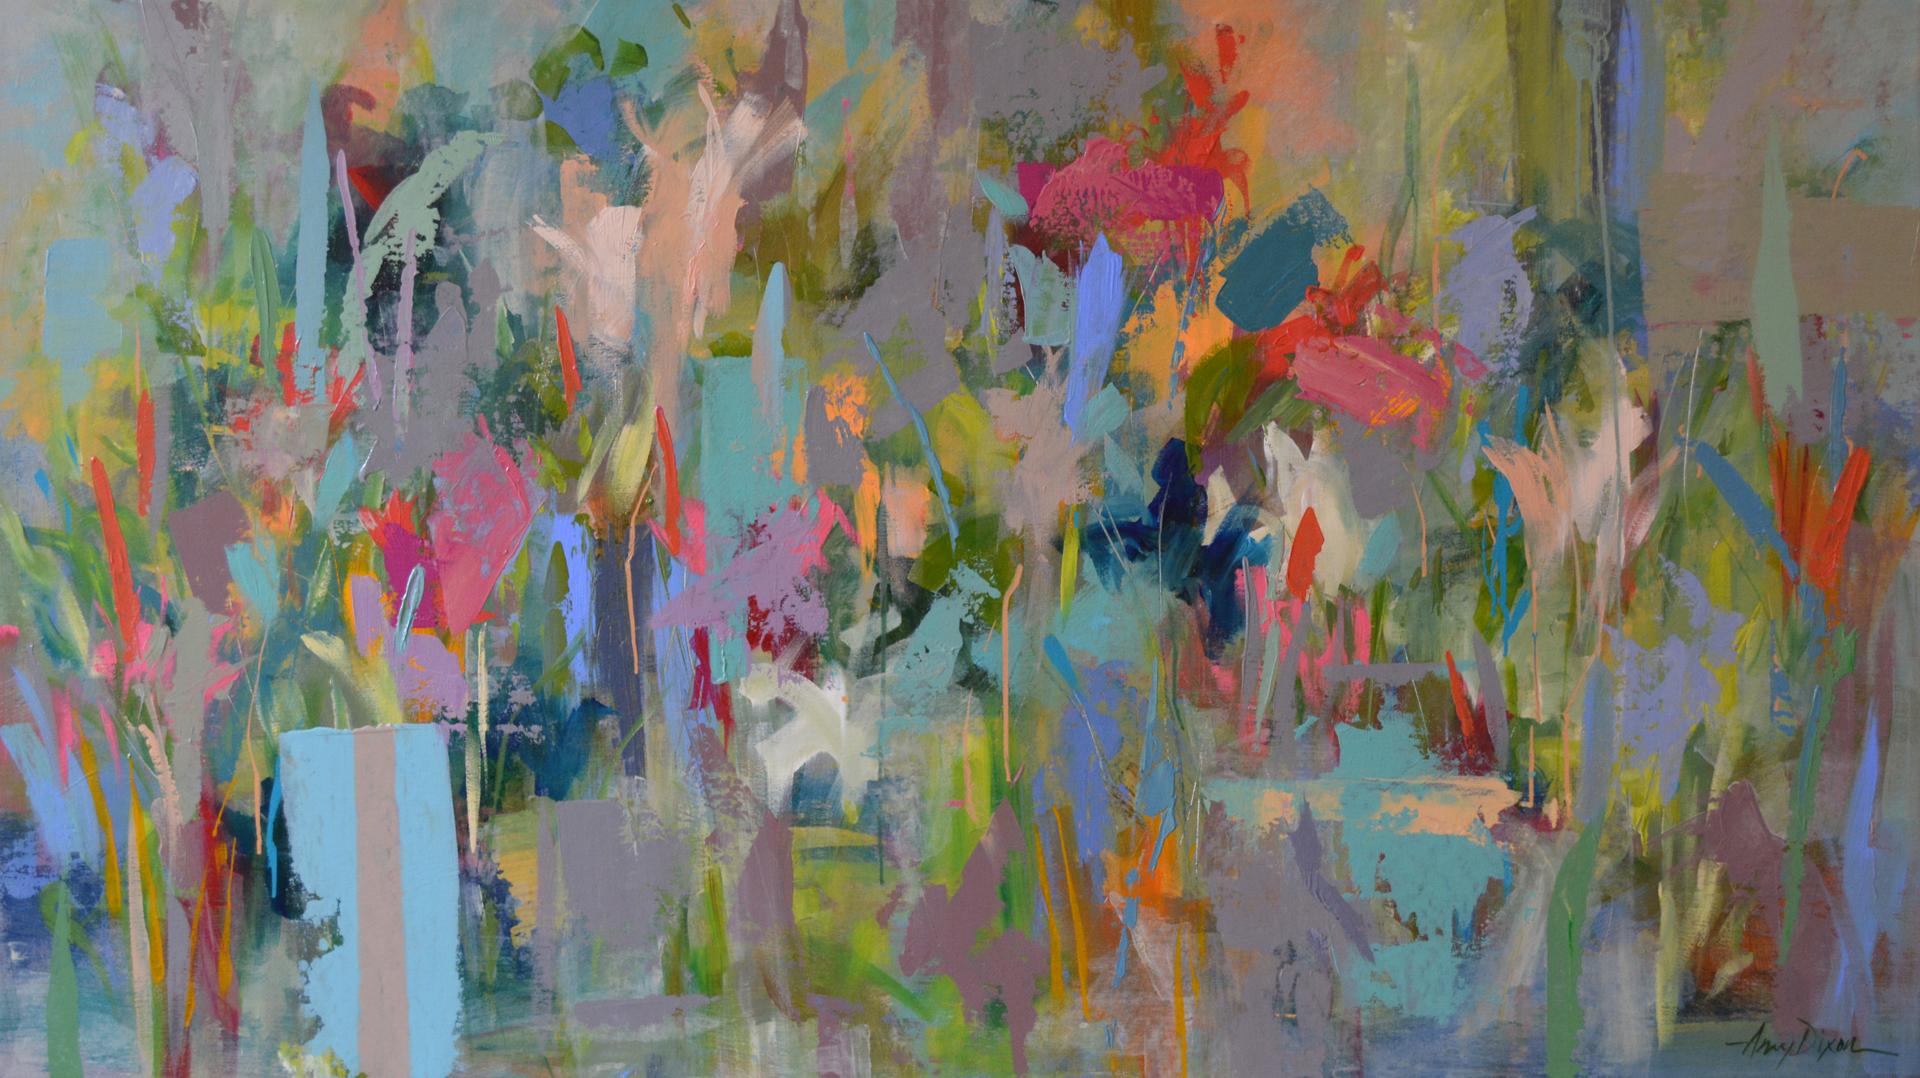 Imaginary Monet by Amy Dixon